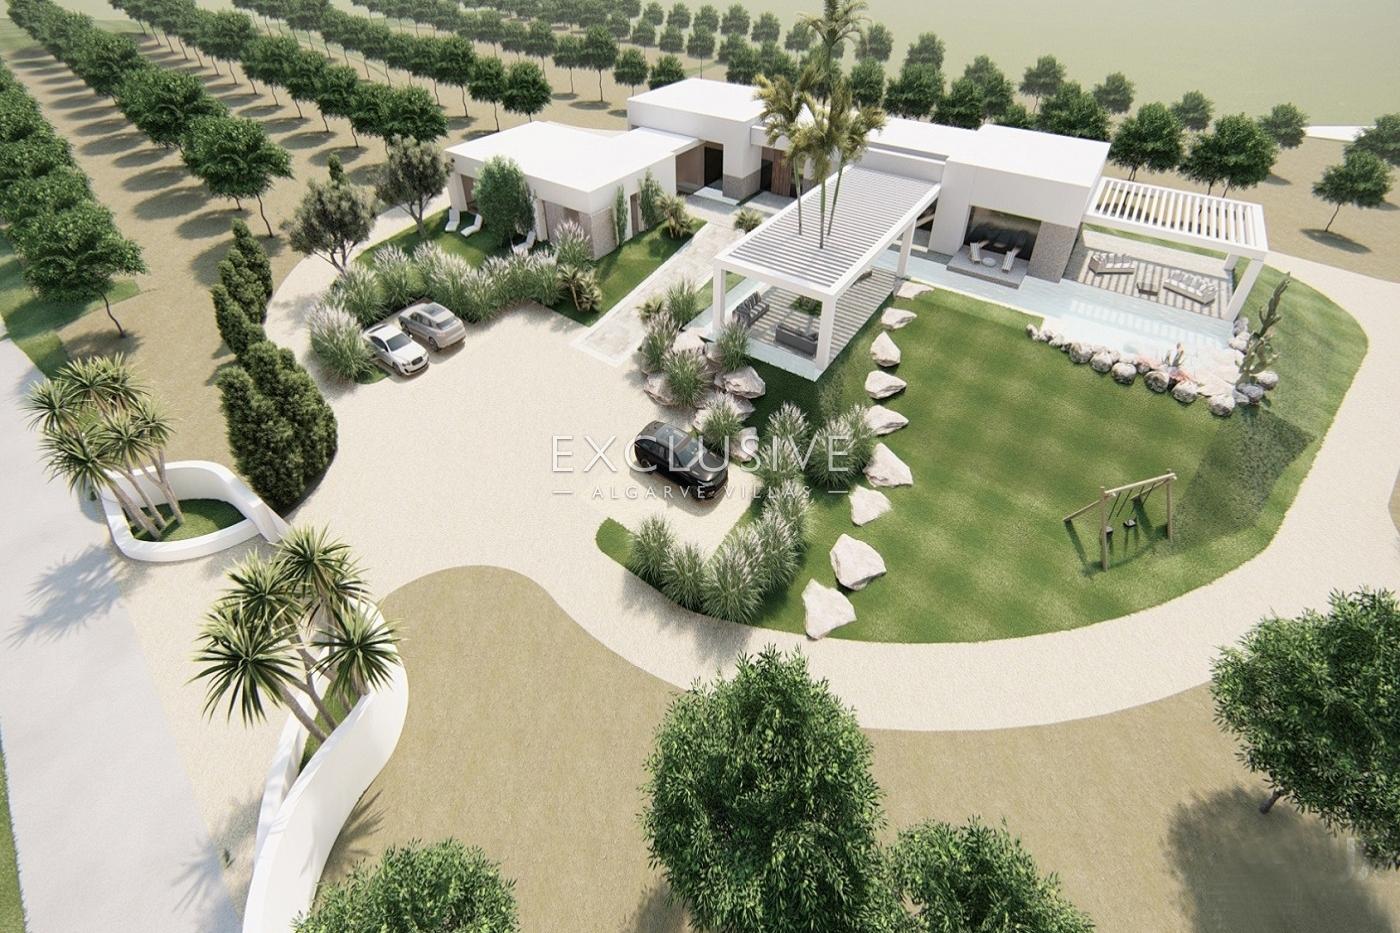 4 hectares Terreno perto Vale do Lobo com projecto para grande casa co_2